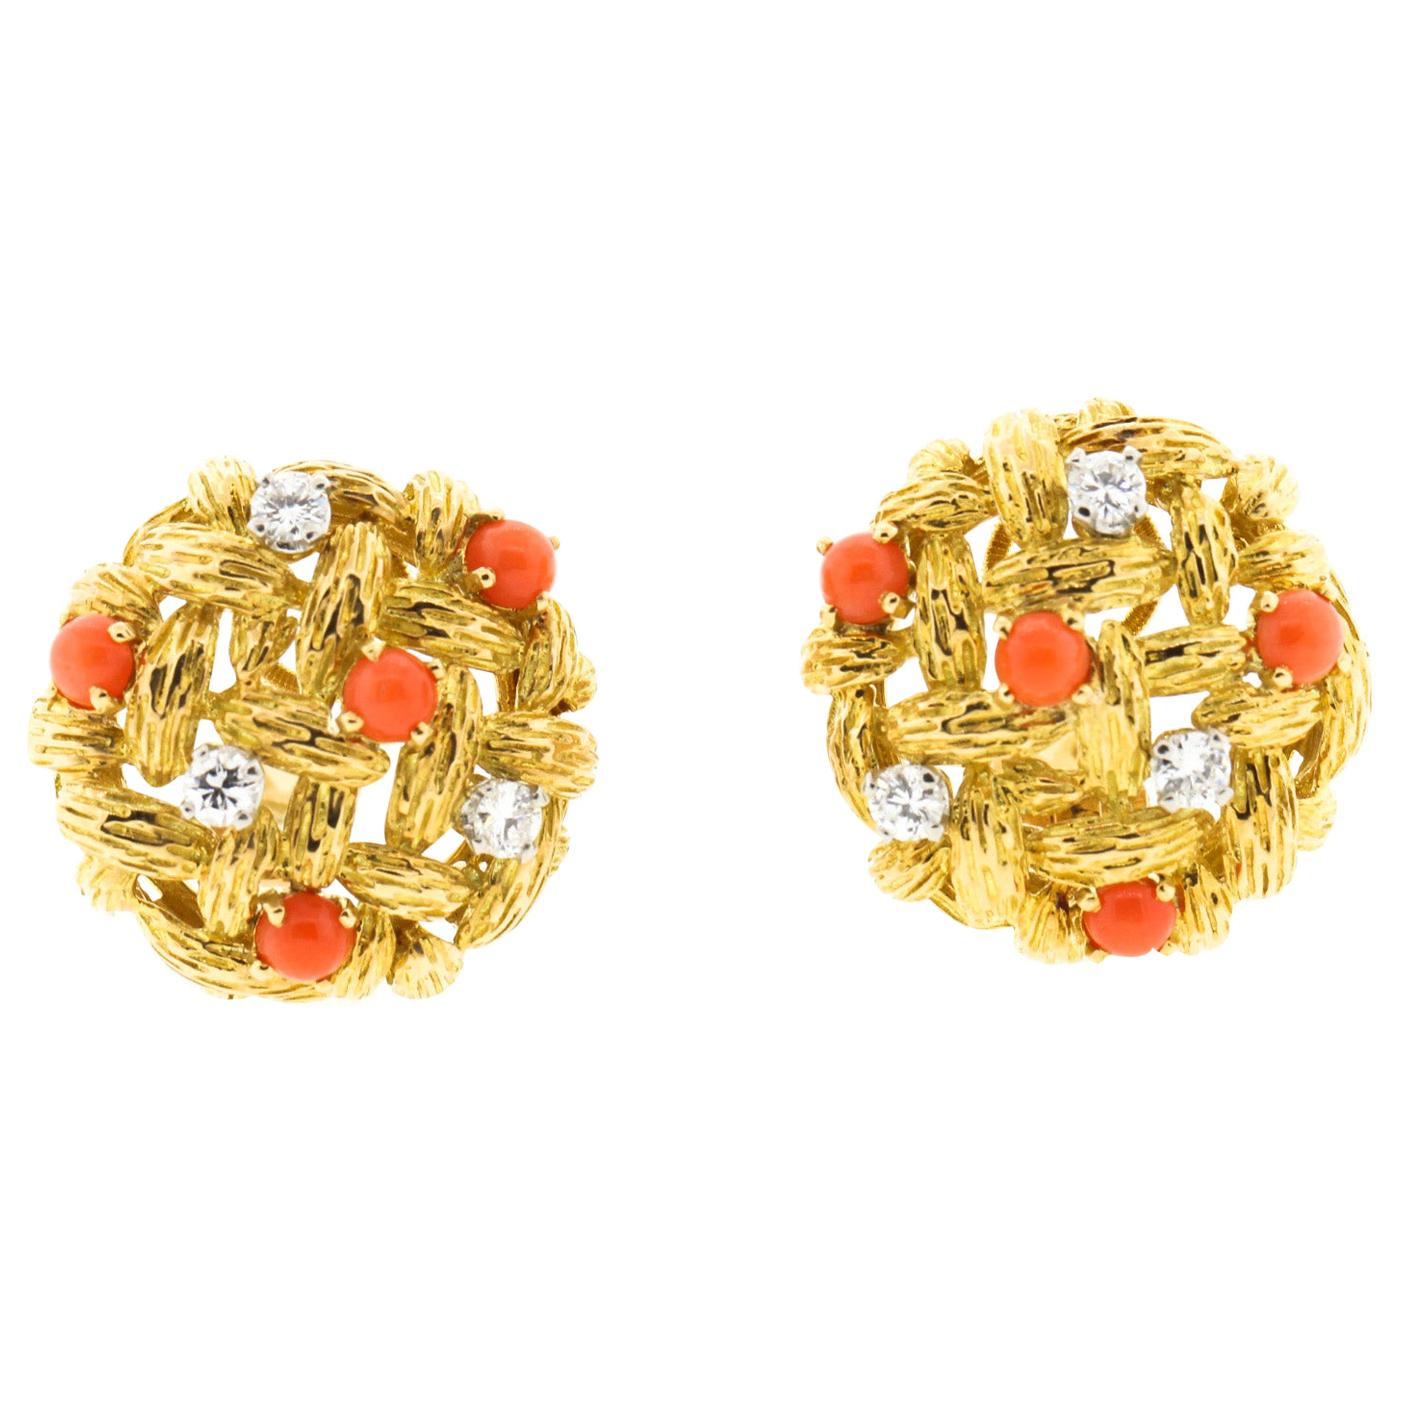 Vintage Mauboussin 18 Karat Gold Coral Diamond Basketweave Earclips